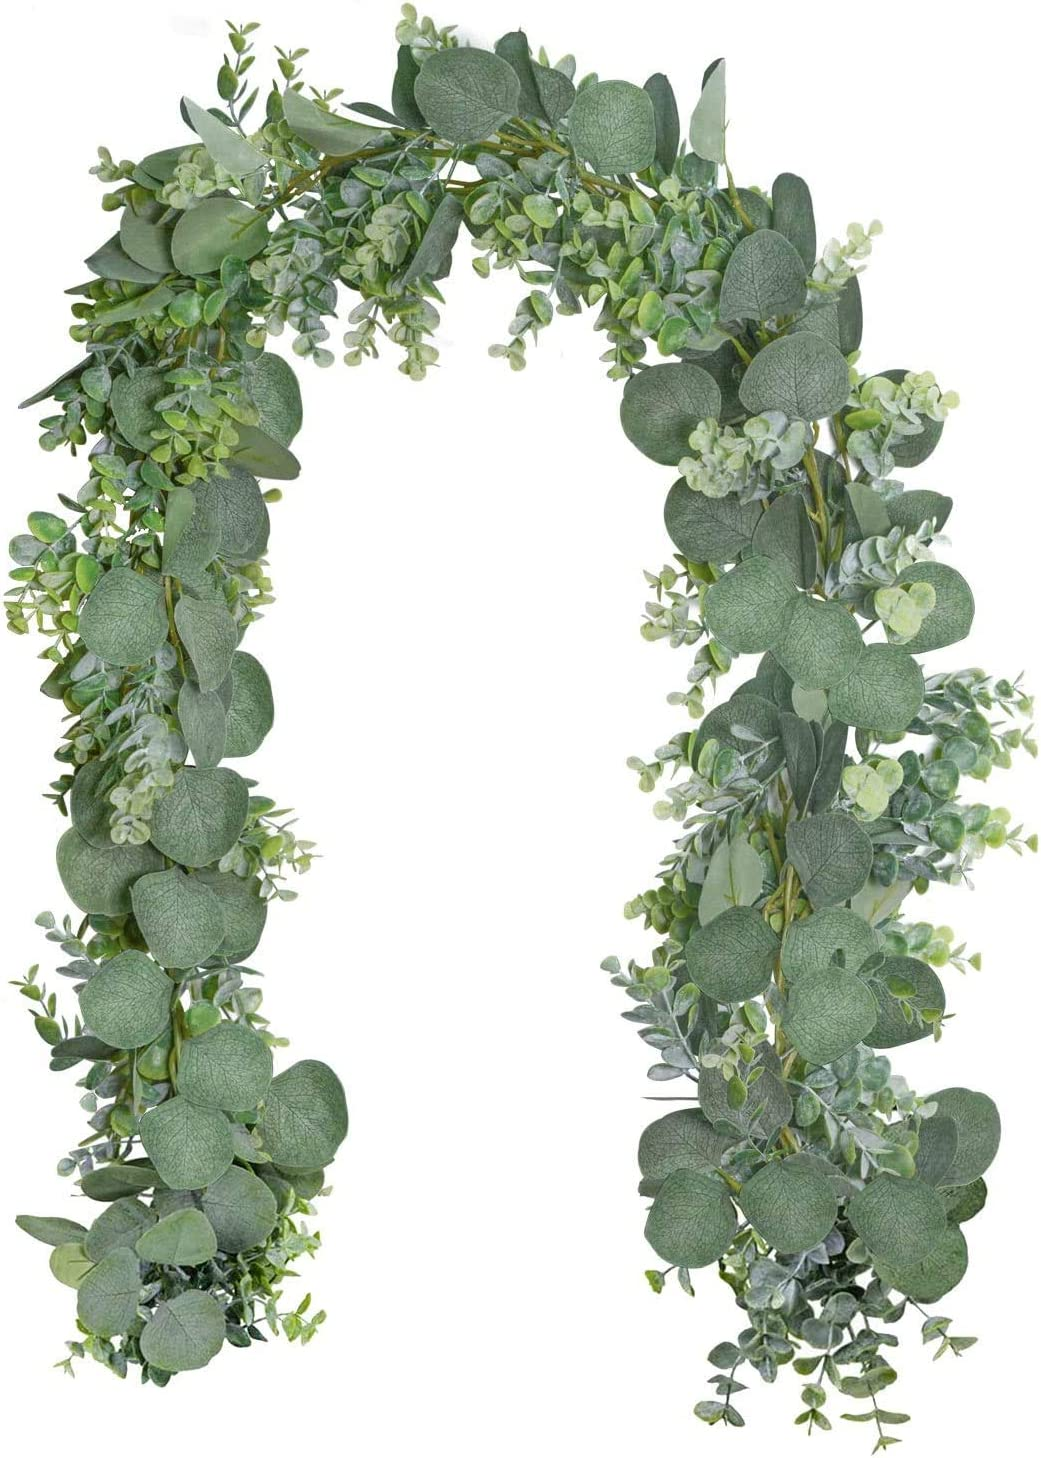 HI NINGER Eucalyptus Garland 6.5' Long Artificial Eucalyptus Leaves Vines, Faux Silk Eucalyptus Garland for Wedding Arch Swag Backdrop Greenery Wall Decor